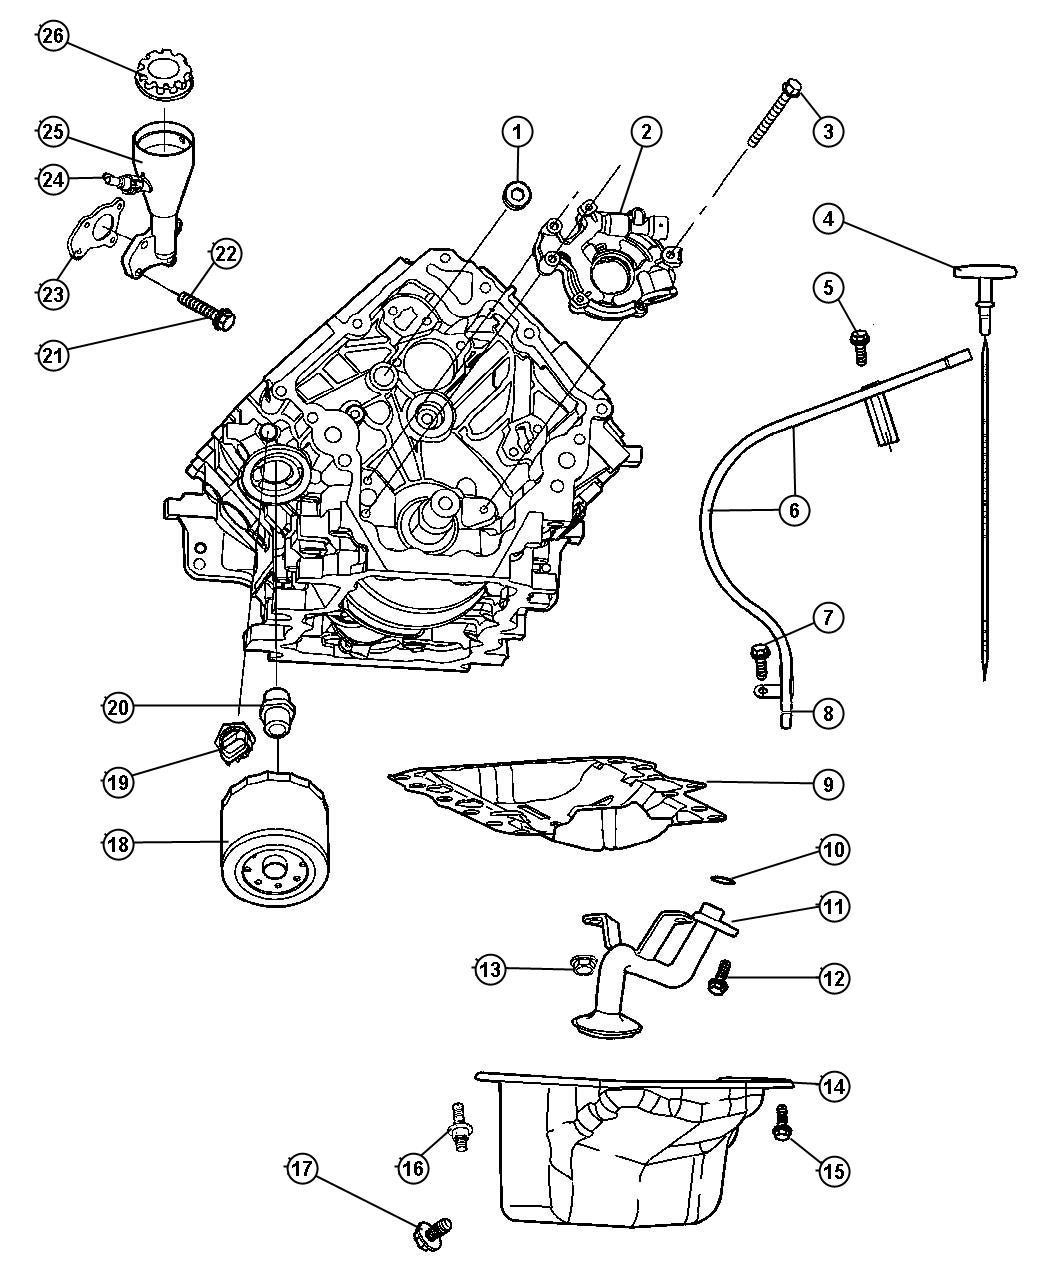 Dodge NITRO Tube. Engine oil indicator, oil gauge. Oiling